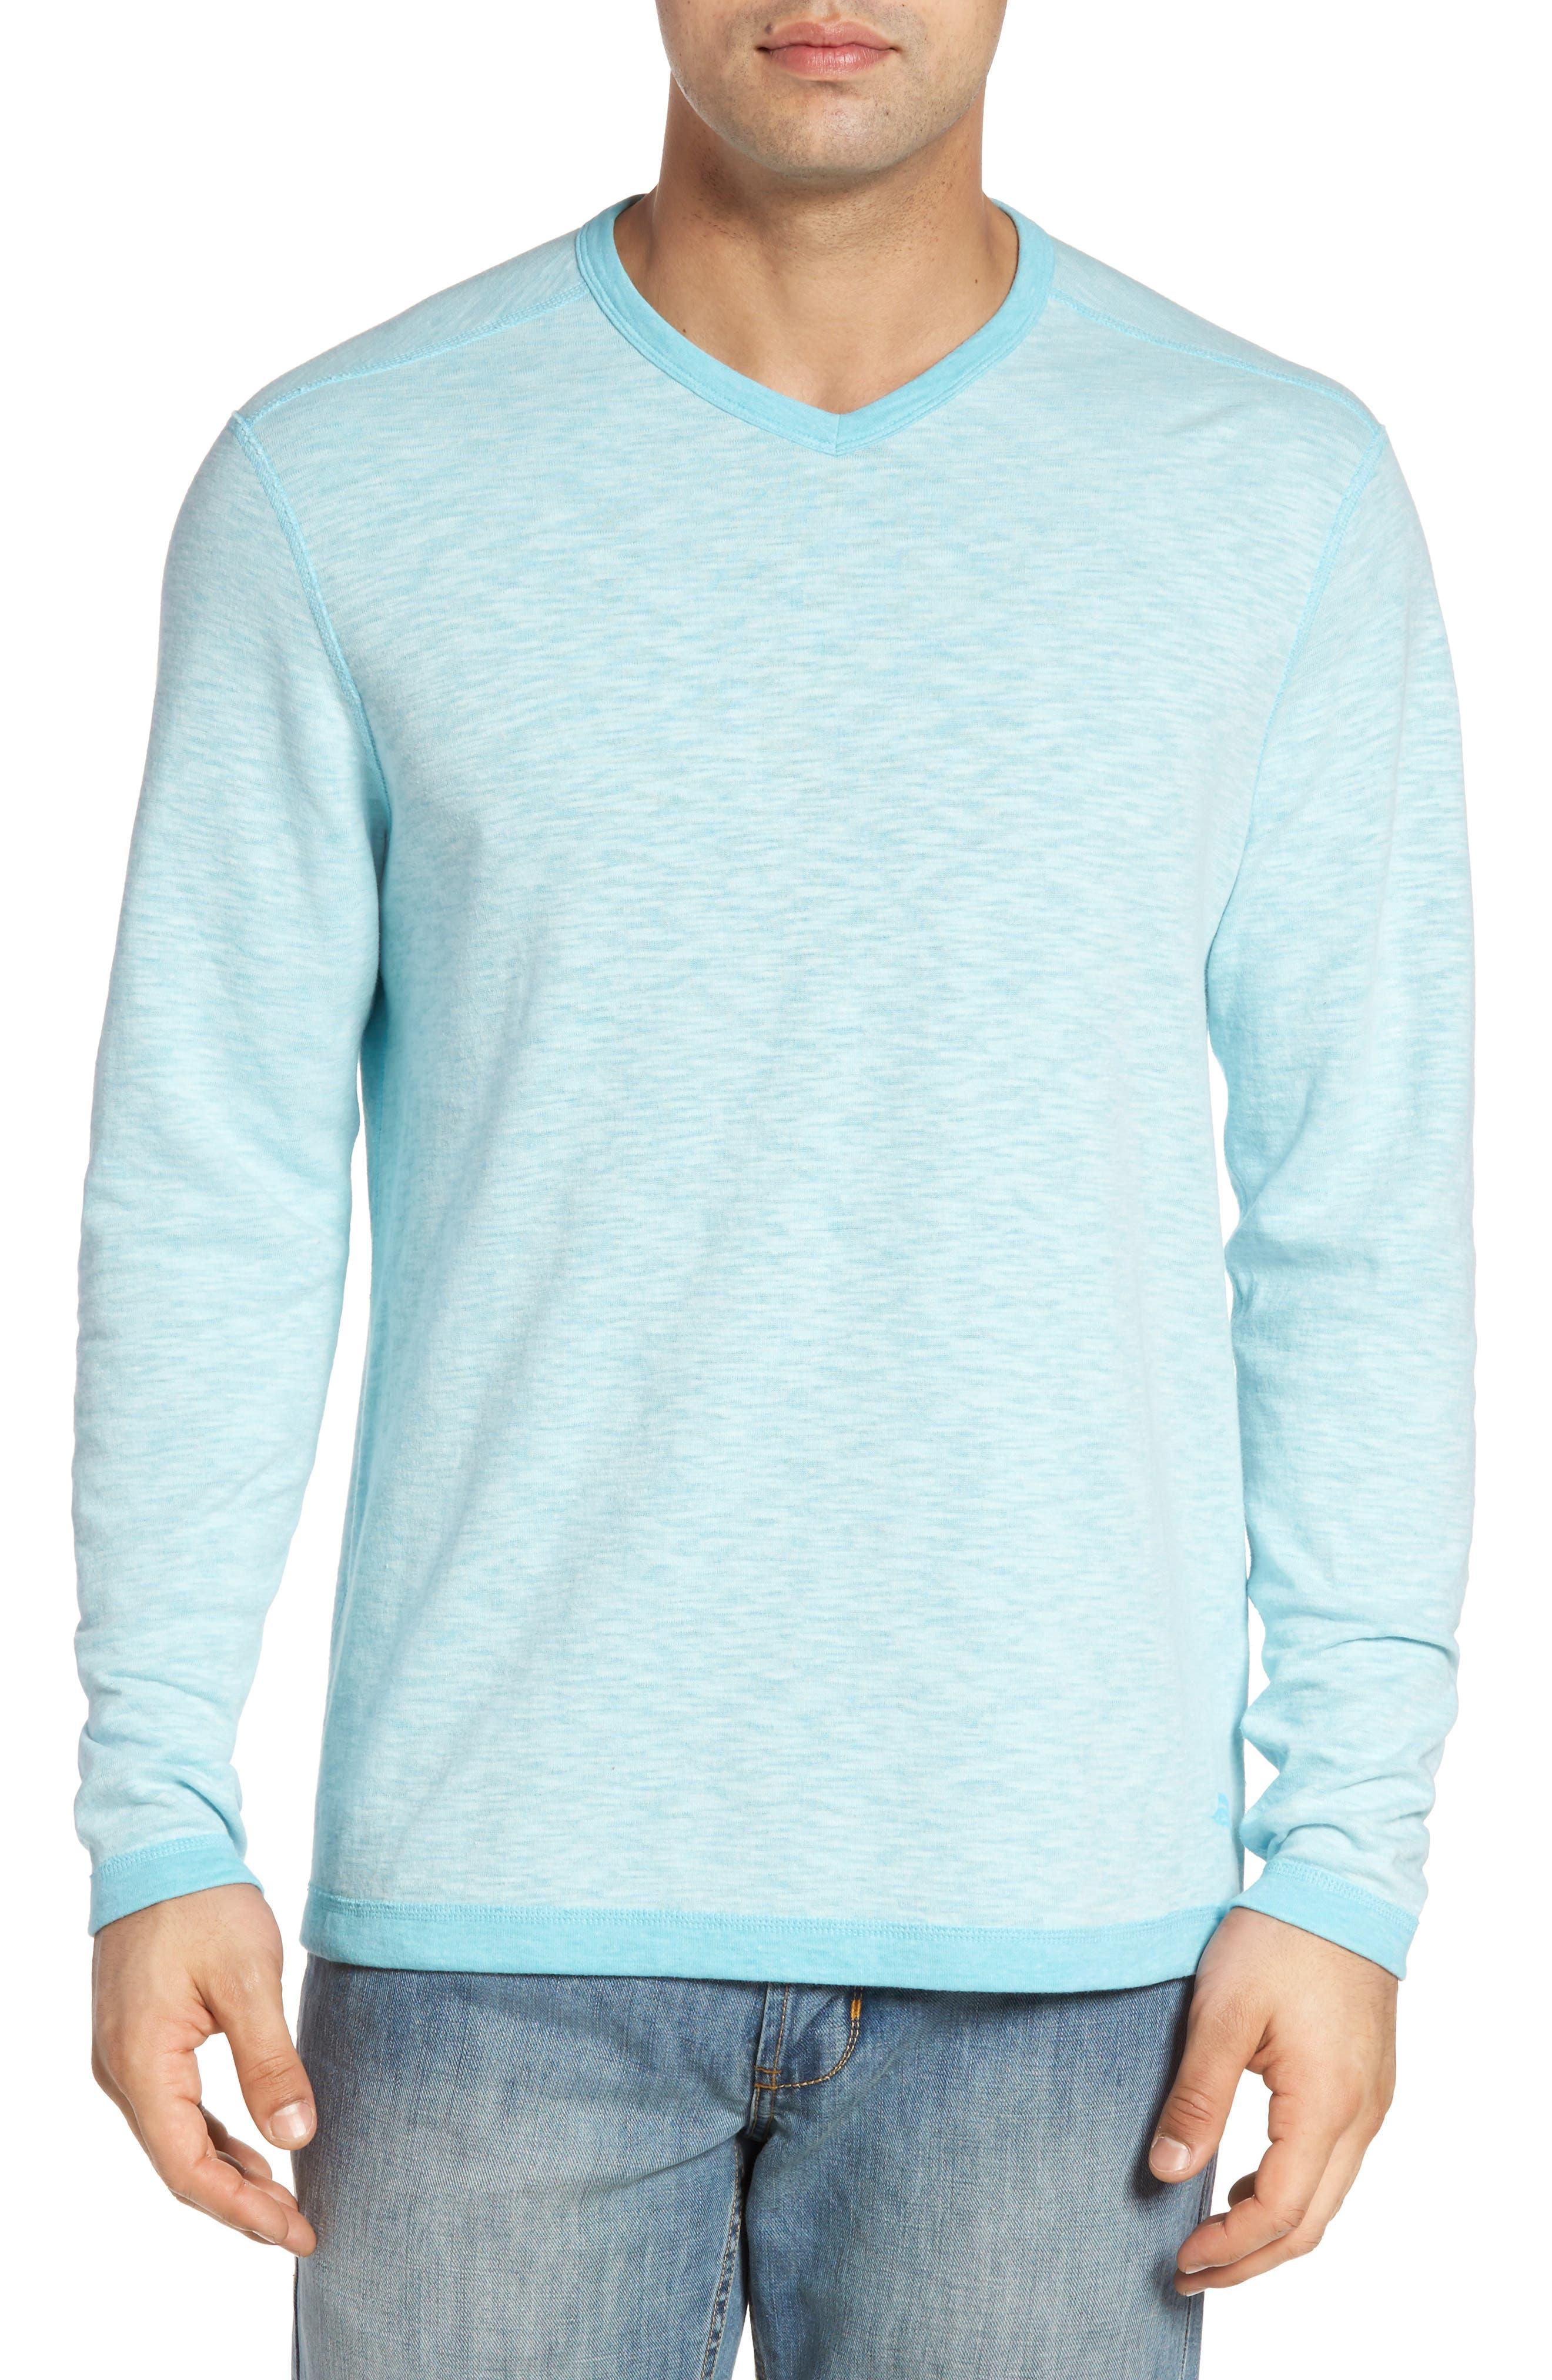 Main Image - Tommy Bahama Seaglass Reversible T-Shirt